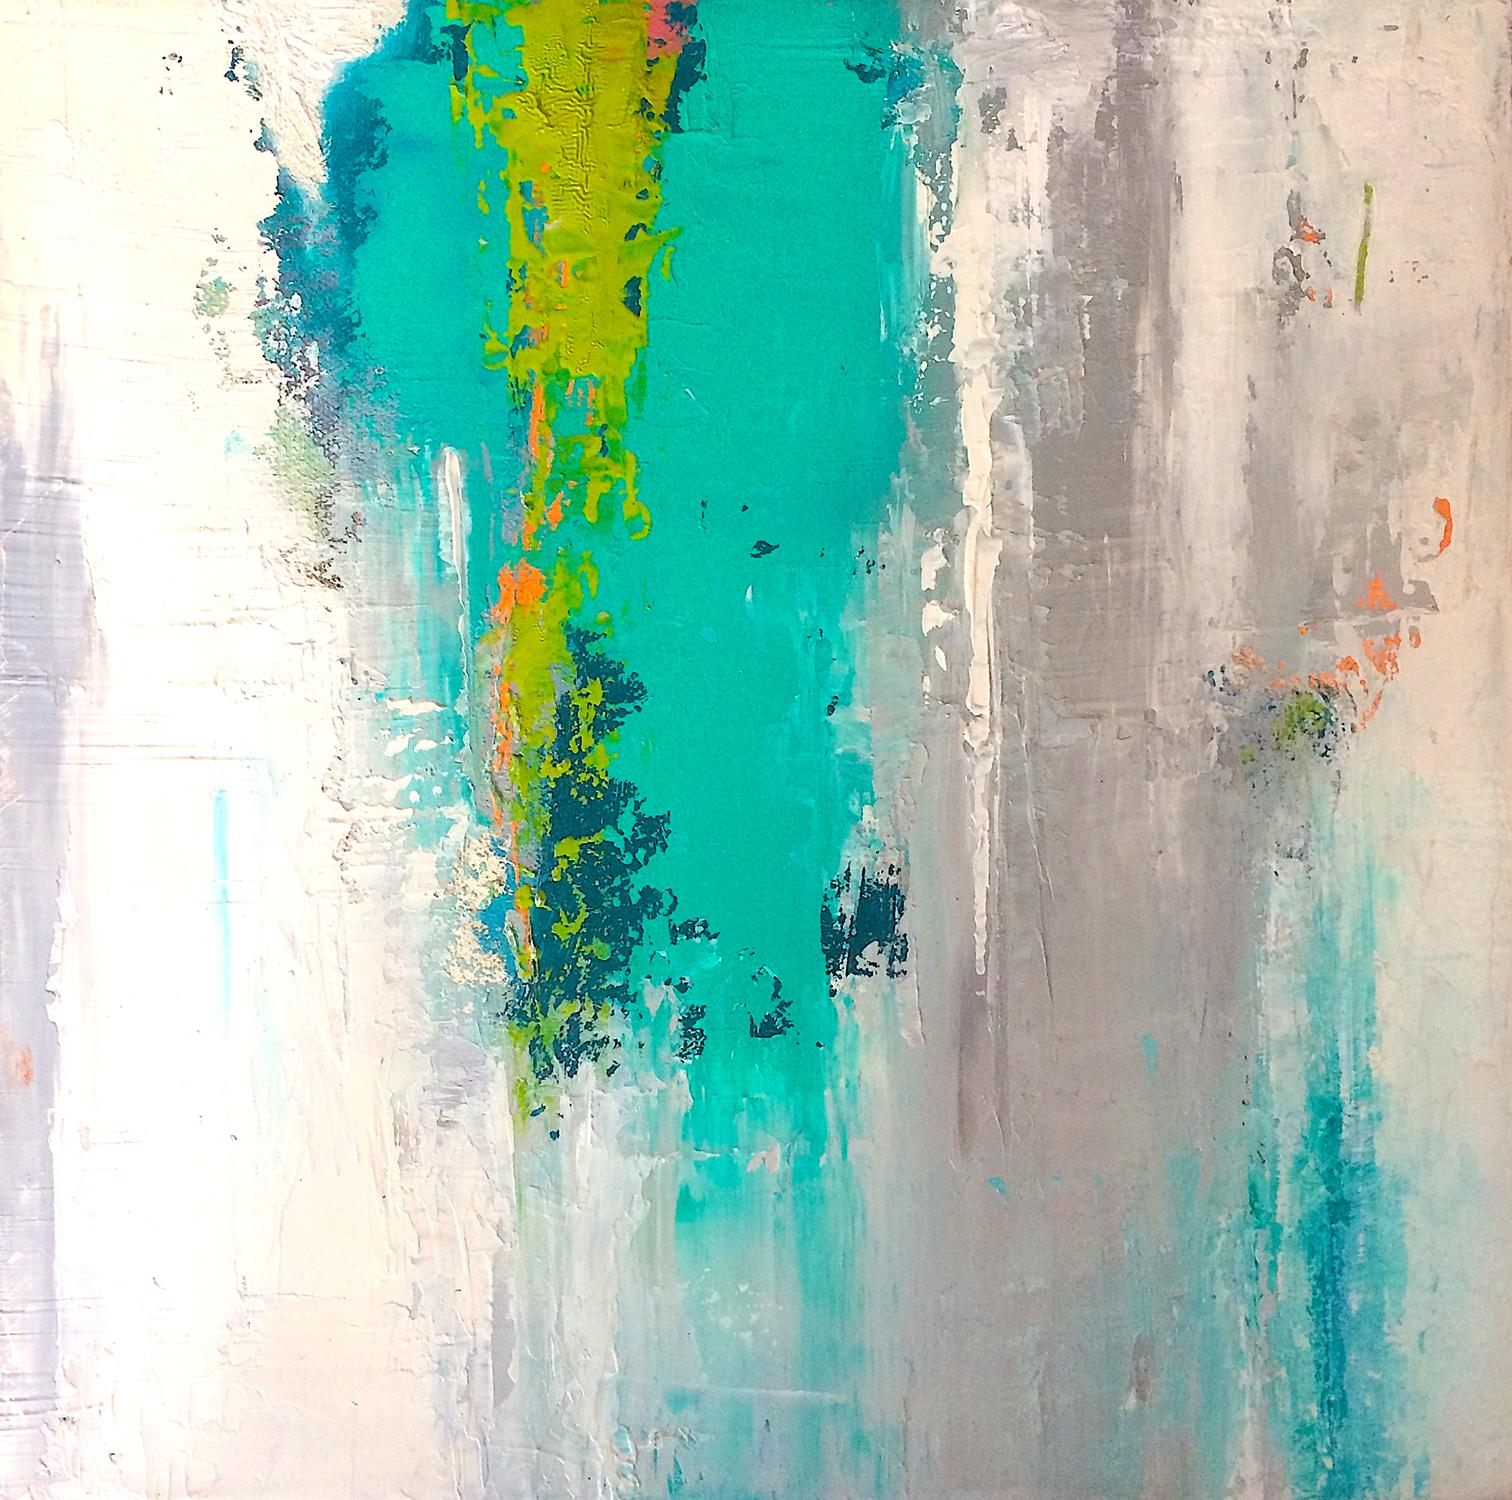 "Aquafall • Oil on canvas • 12 x 12"""